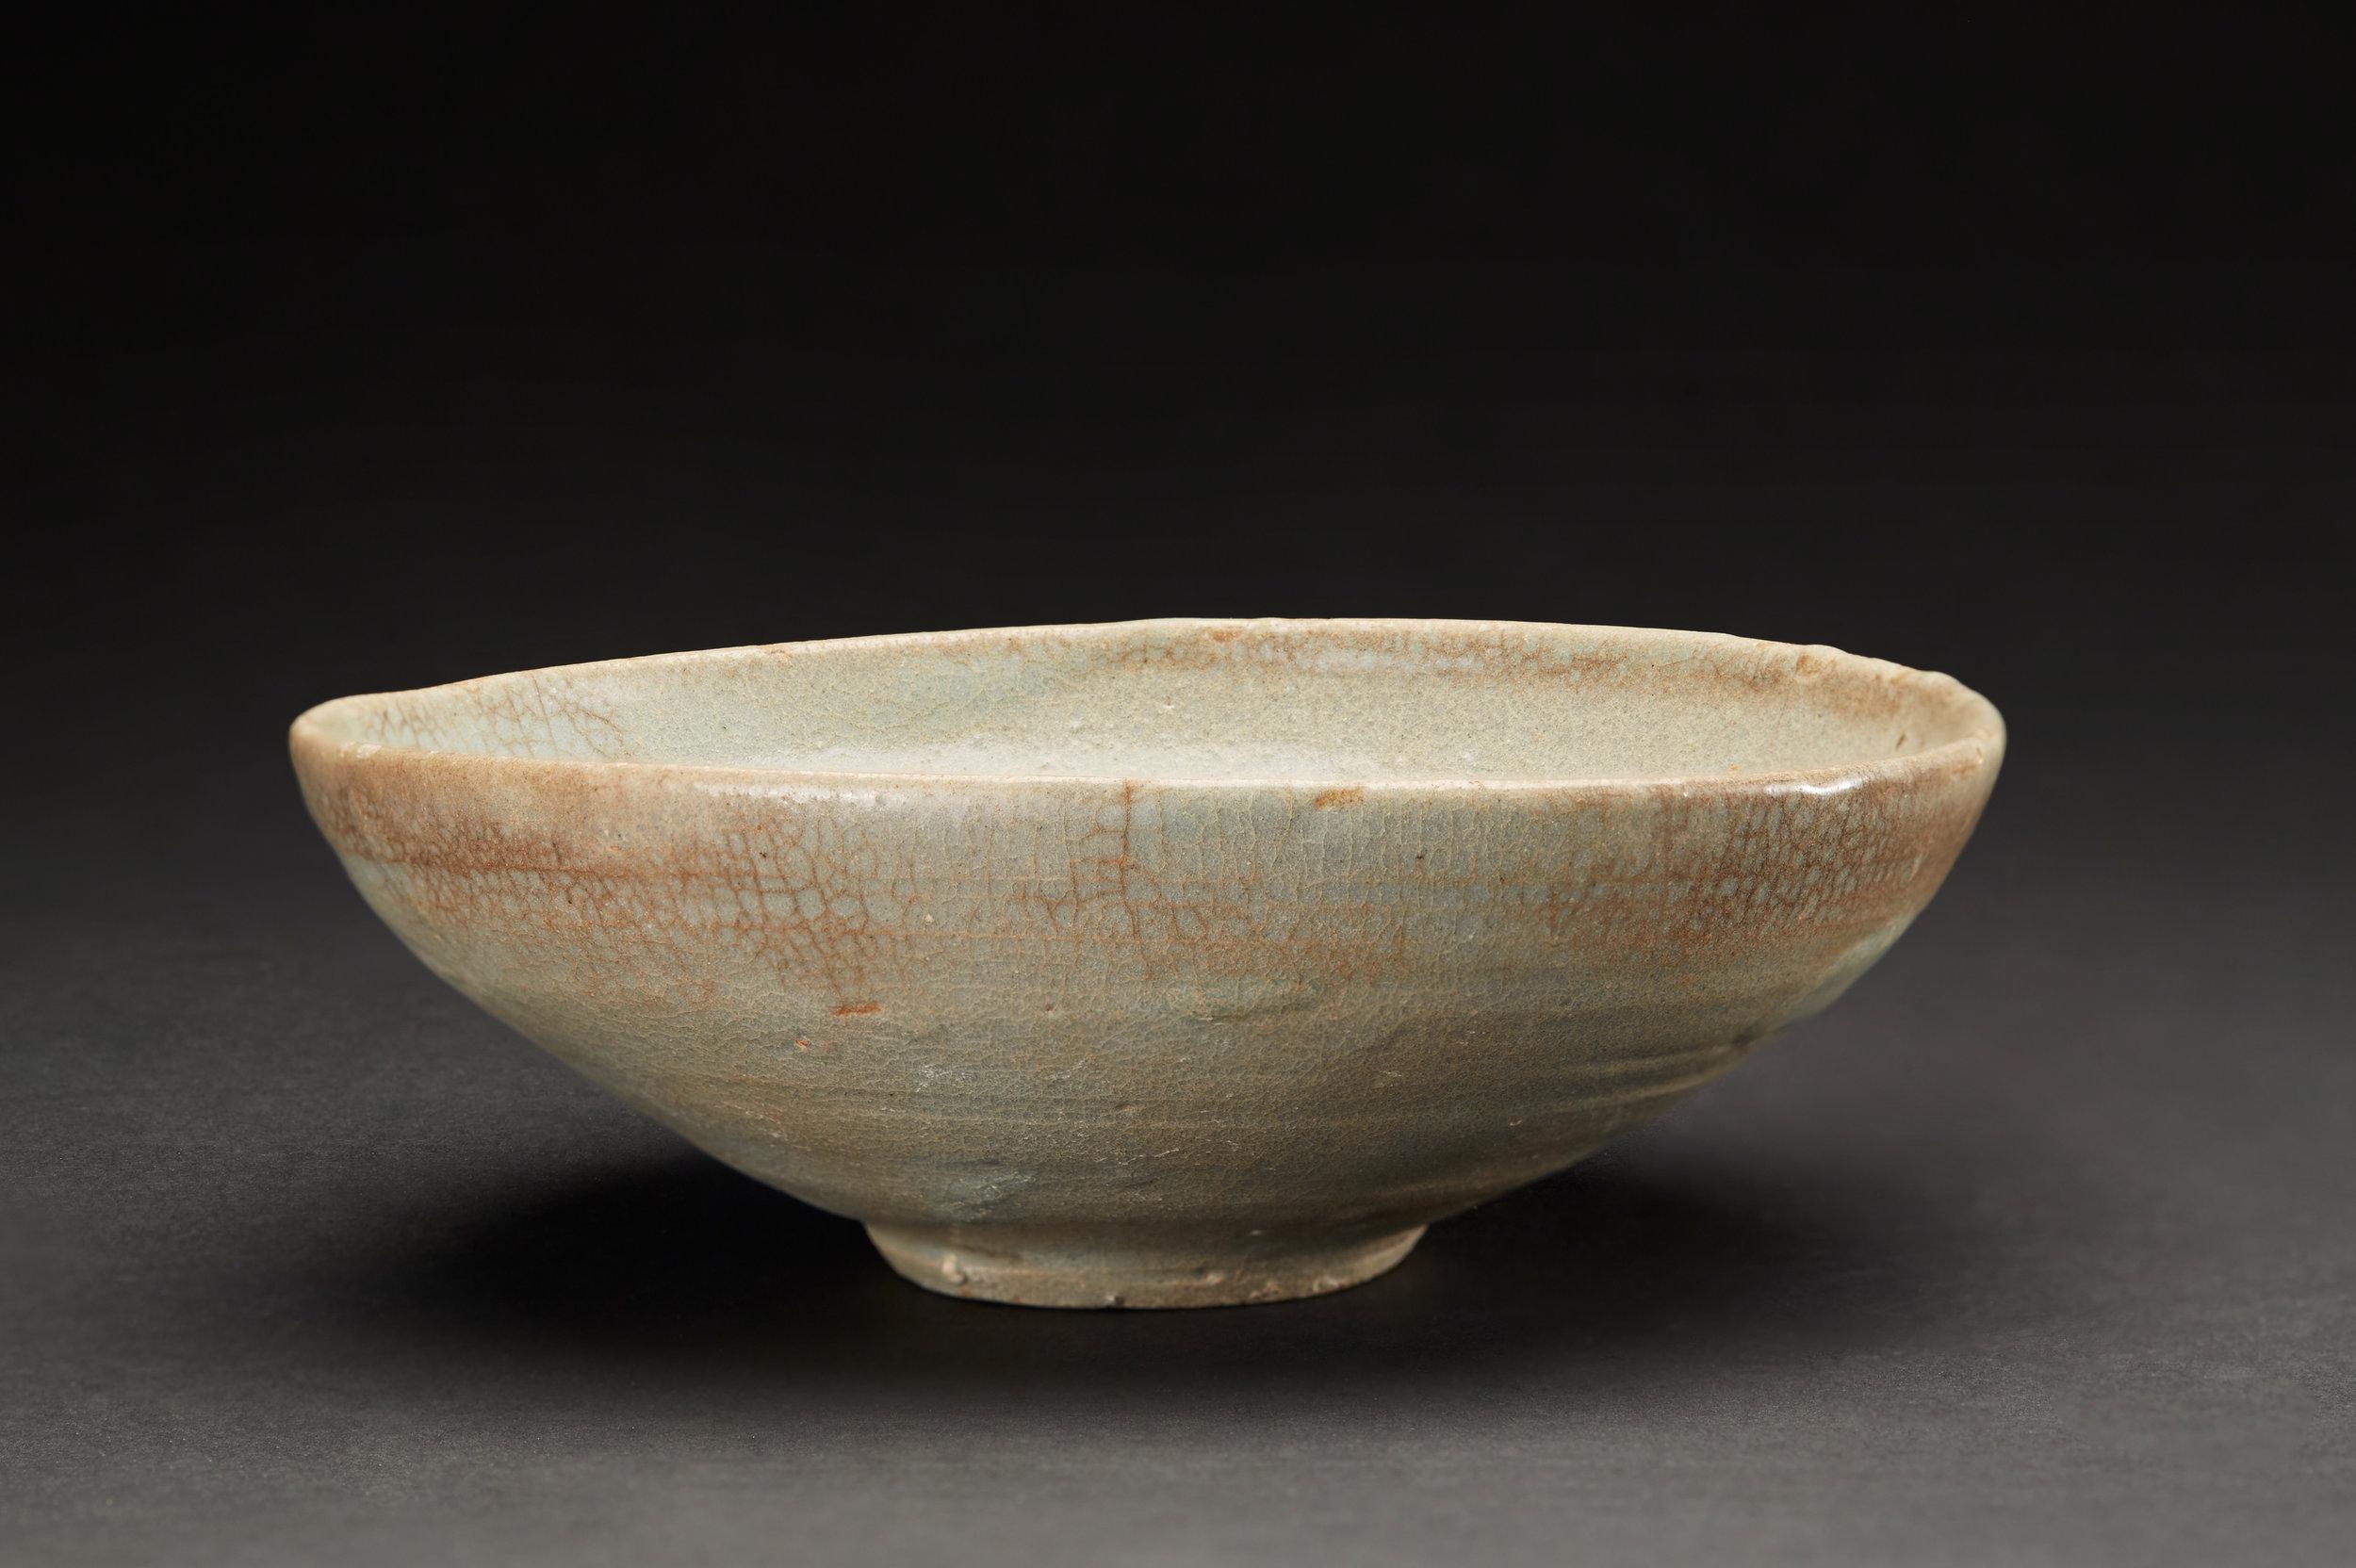 Korean Ceramics  Summer Tea Bowl  , C. Mid-Chosun Period (17-18th Century) Porcelain 6.5 x 2.25 inches 16.5 x 5.7 cm KCer 19